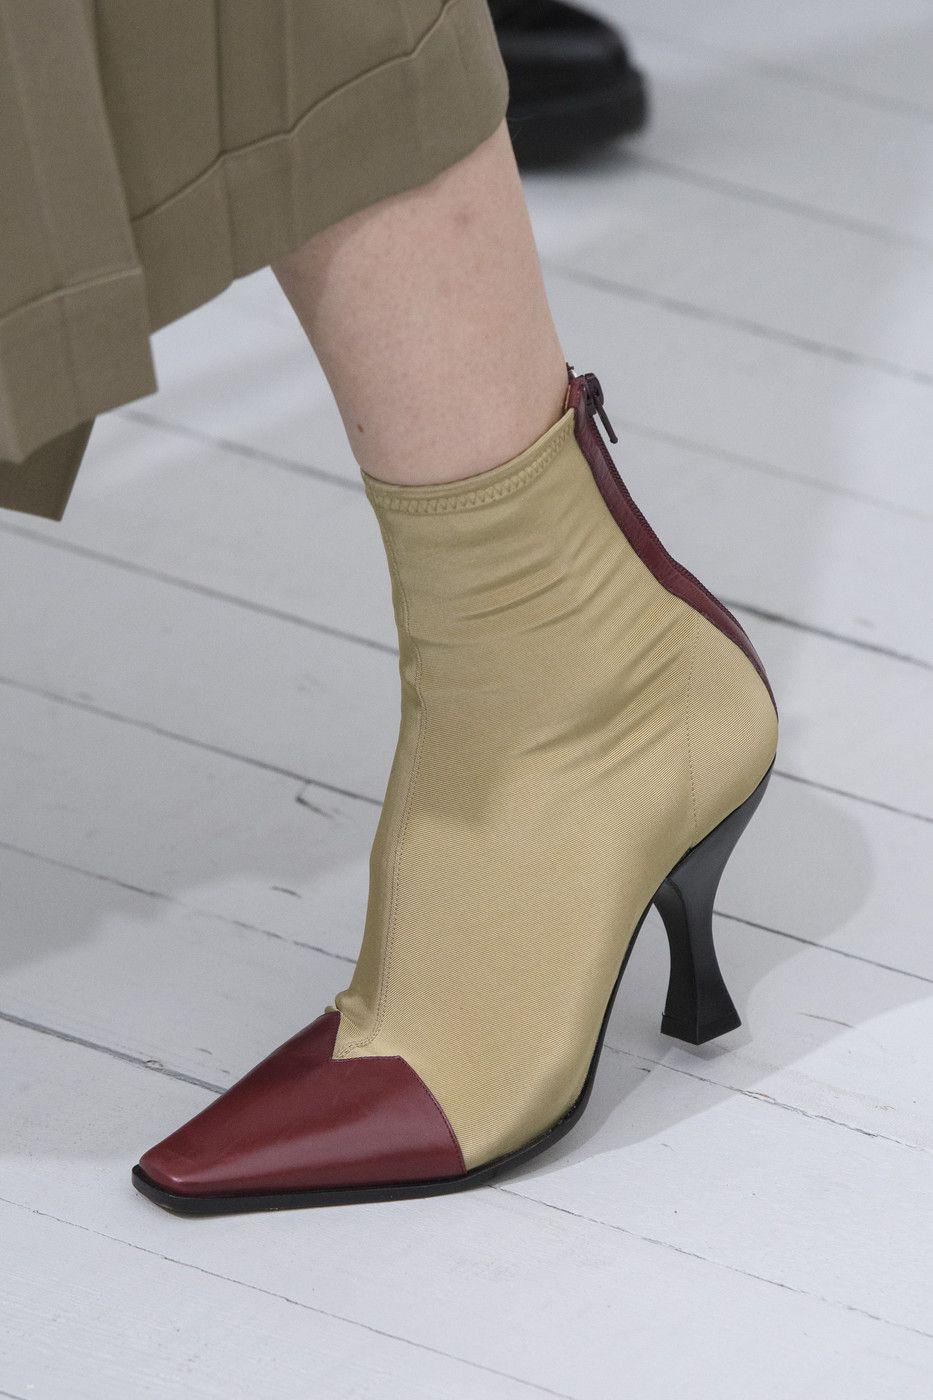 Zapatos rojos formales Celine para mujer B92lhJTGjG